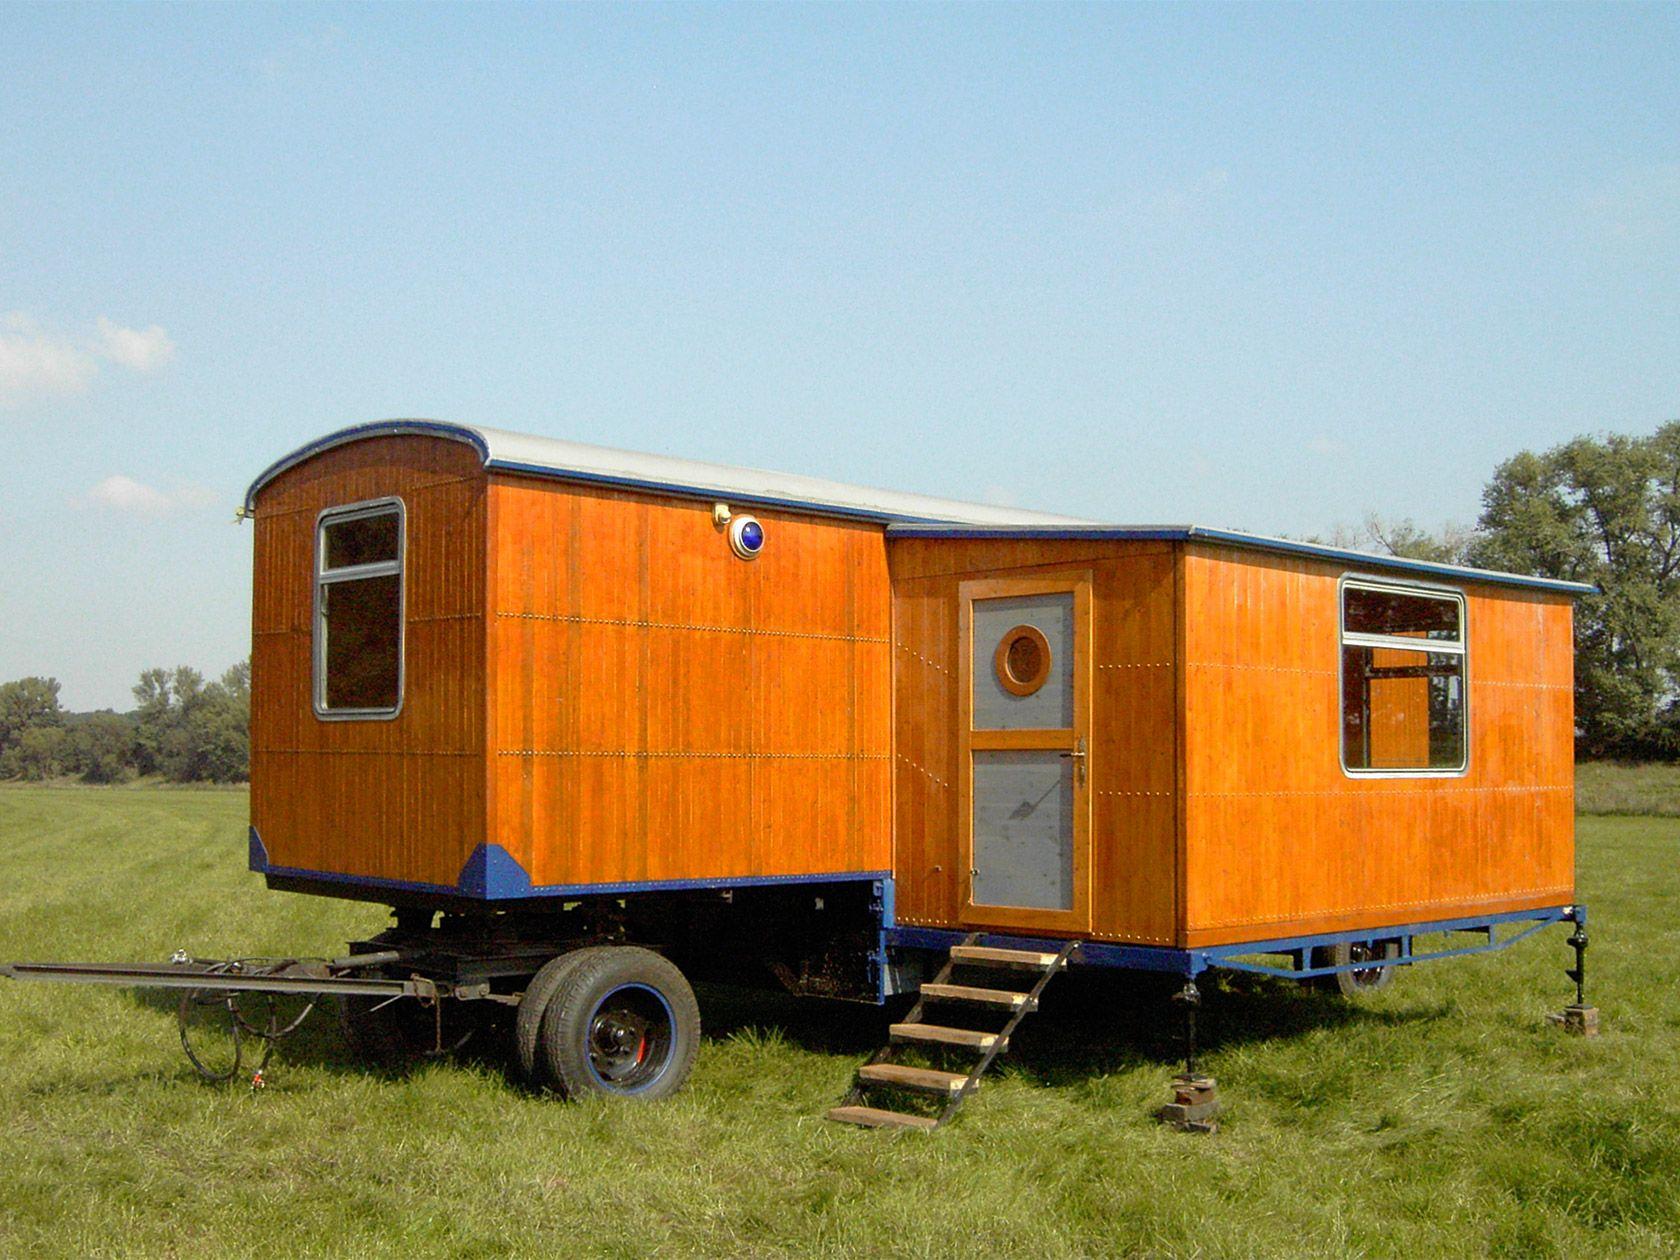 bauwagen mit runddach zirkuswagen manufaktur bauwagen house tiny house und building a house. Black Bedroom Furniture Sets. Home Design Ideas